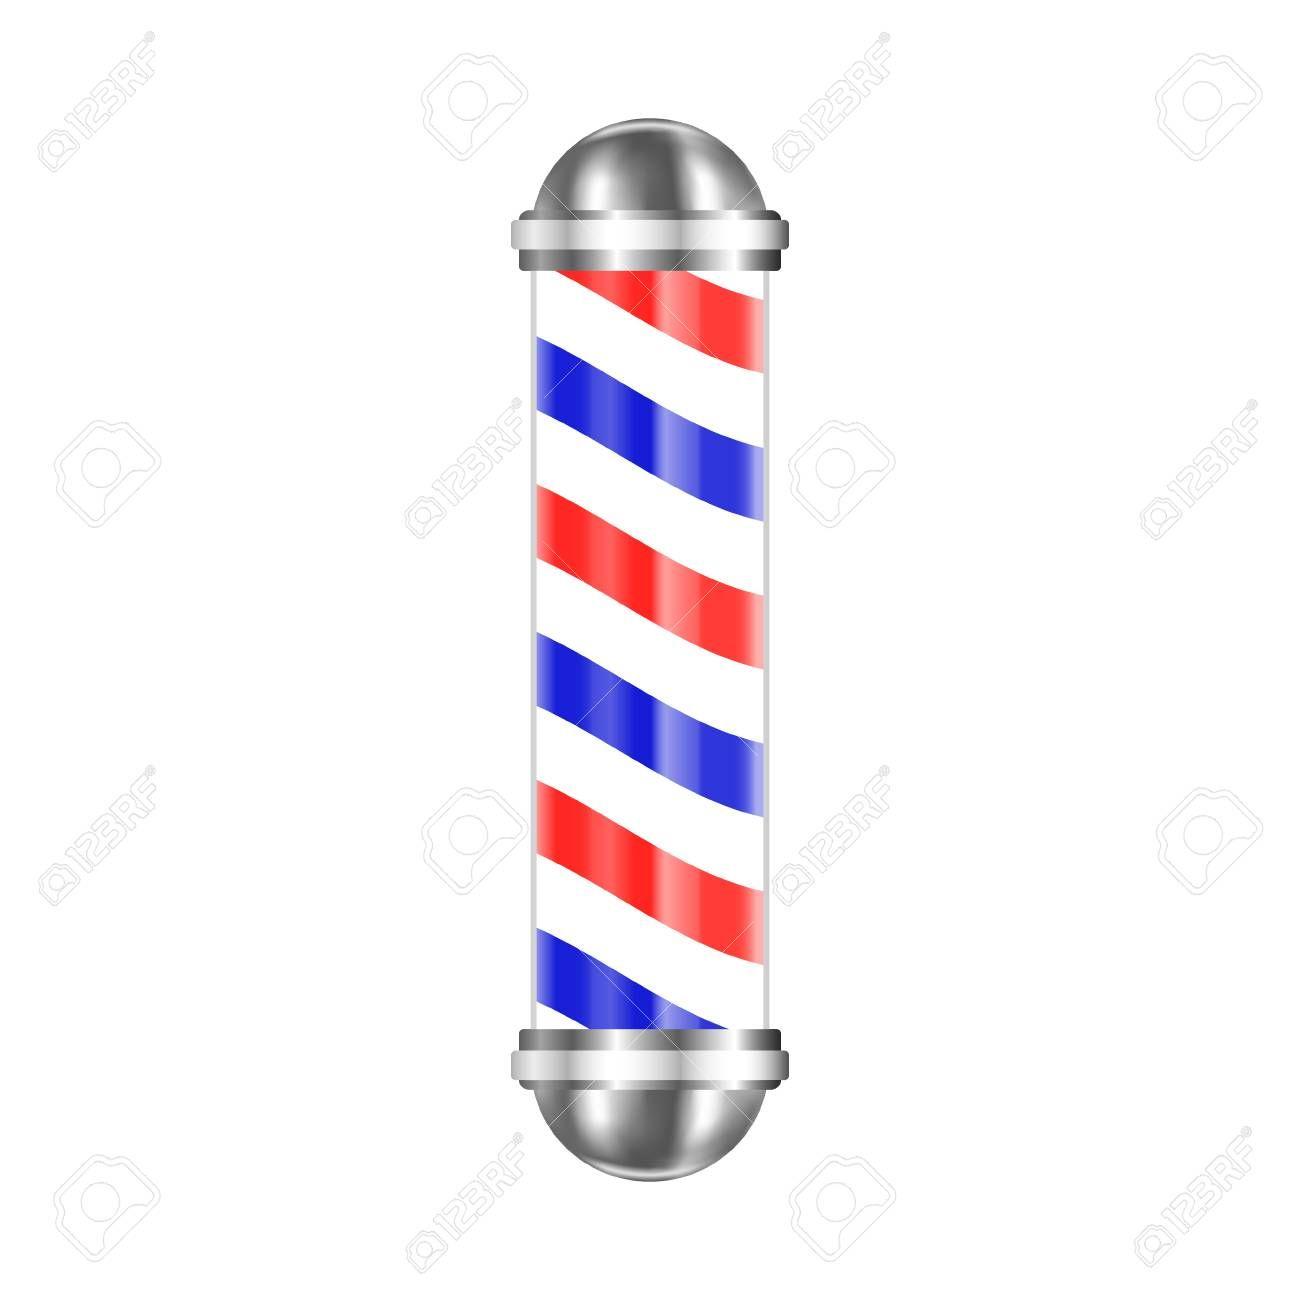 Barbershop Pole Isolated On White Background Vector Illustration Ad Isolated Pole Barbershop White Barber Shop Pole Barber Shop White Background